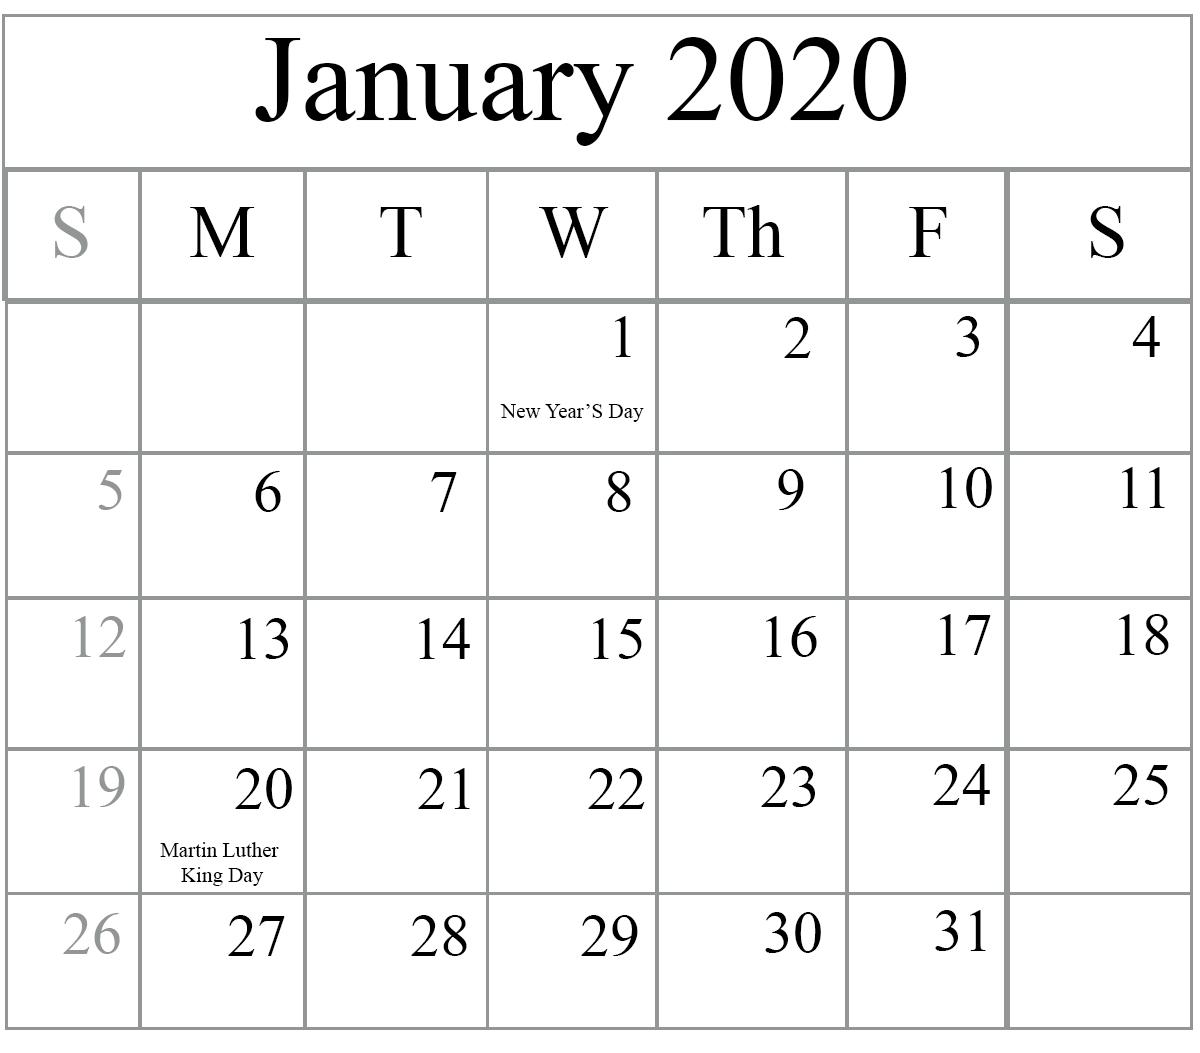 Free January 2020 Printable Calendar In Pdf, Excel & Word-2020 January Calendar Sri Lanka